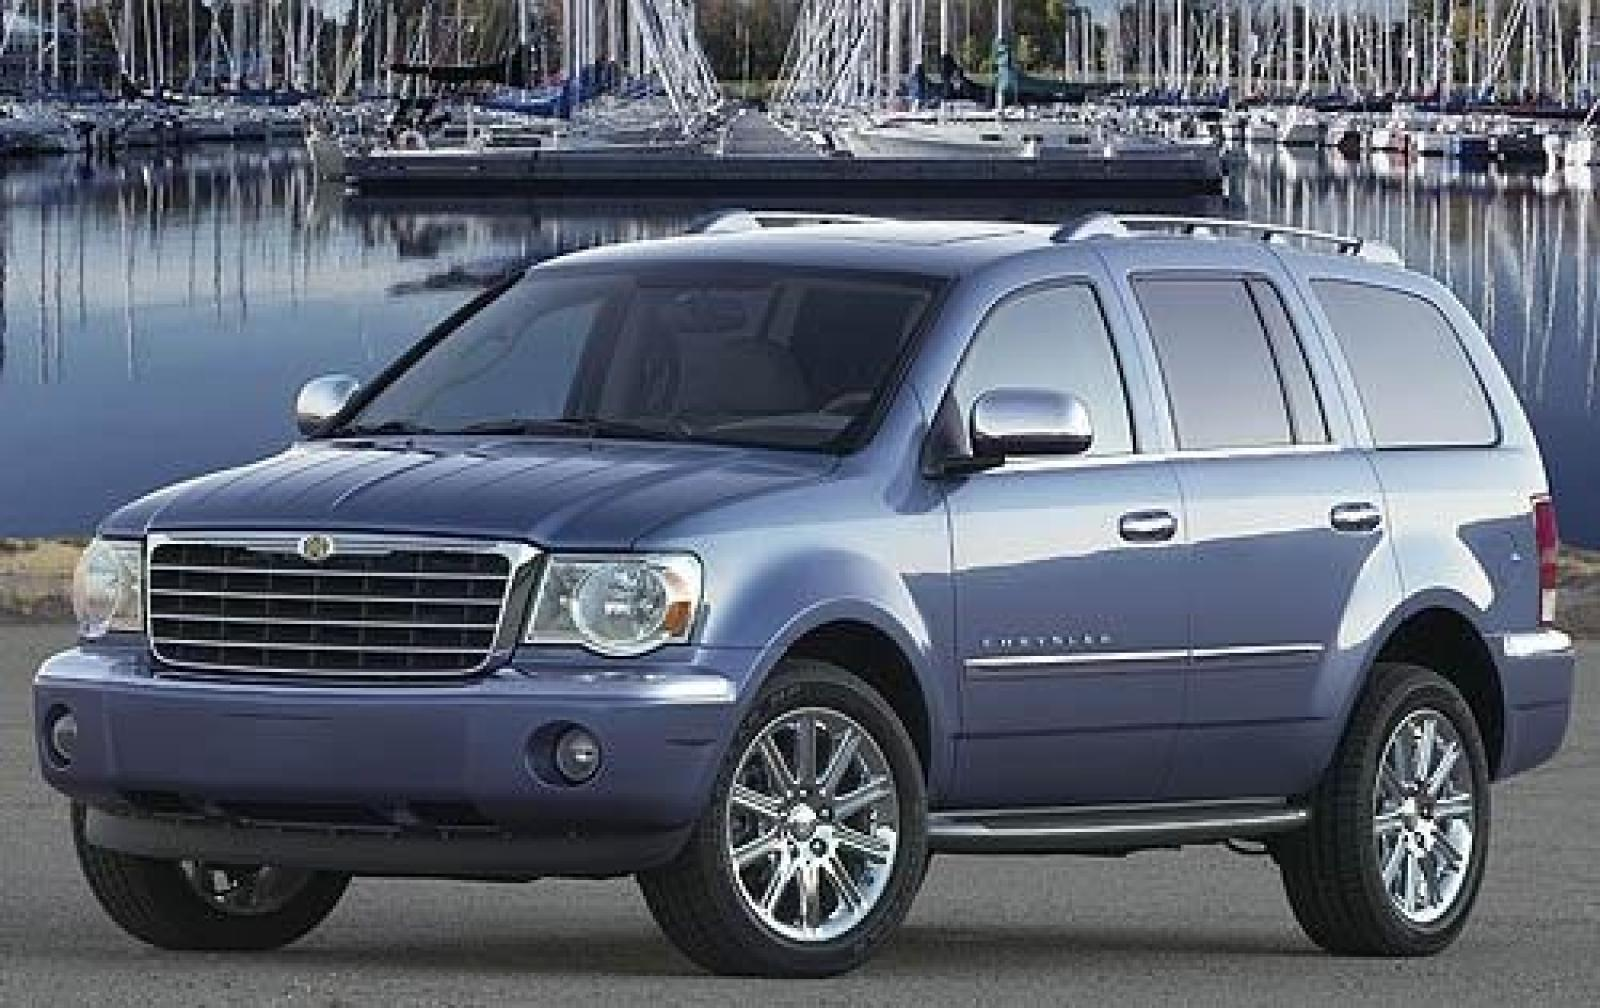 Chrysler Aspen 2006 - 2008 SUV 5 door #4